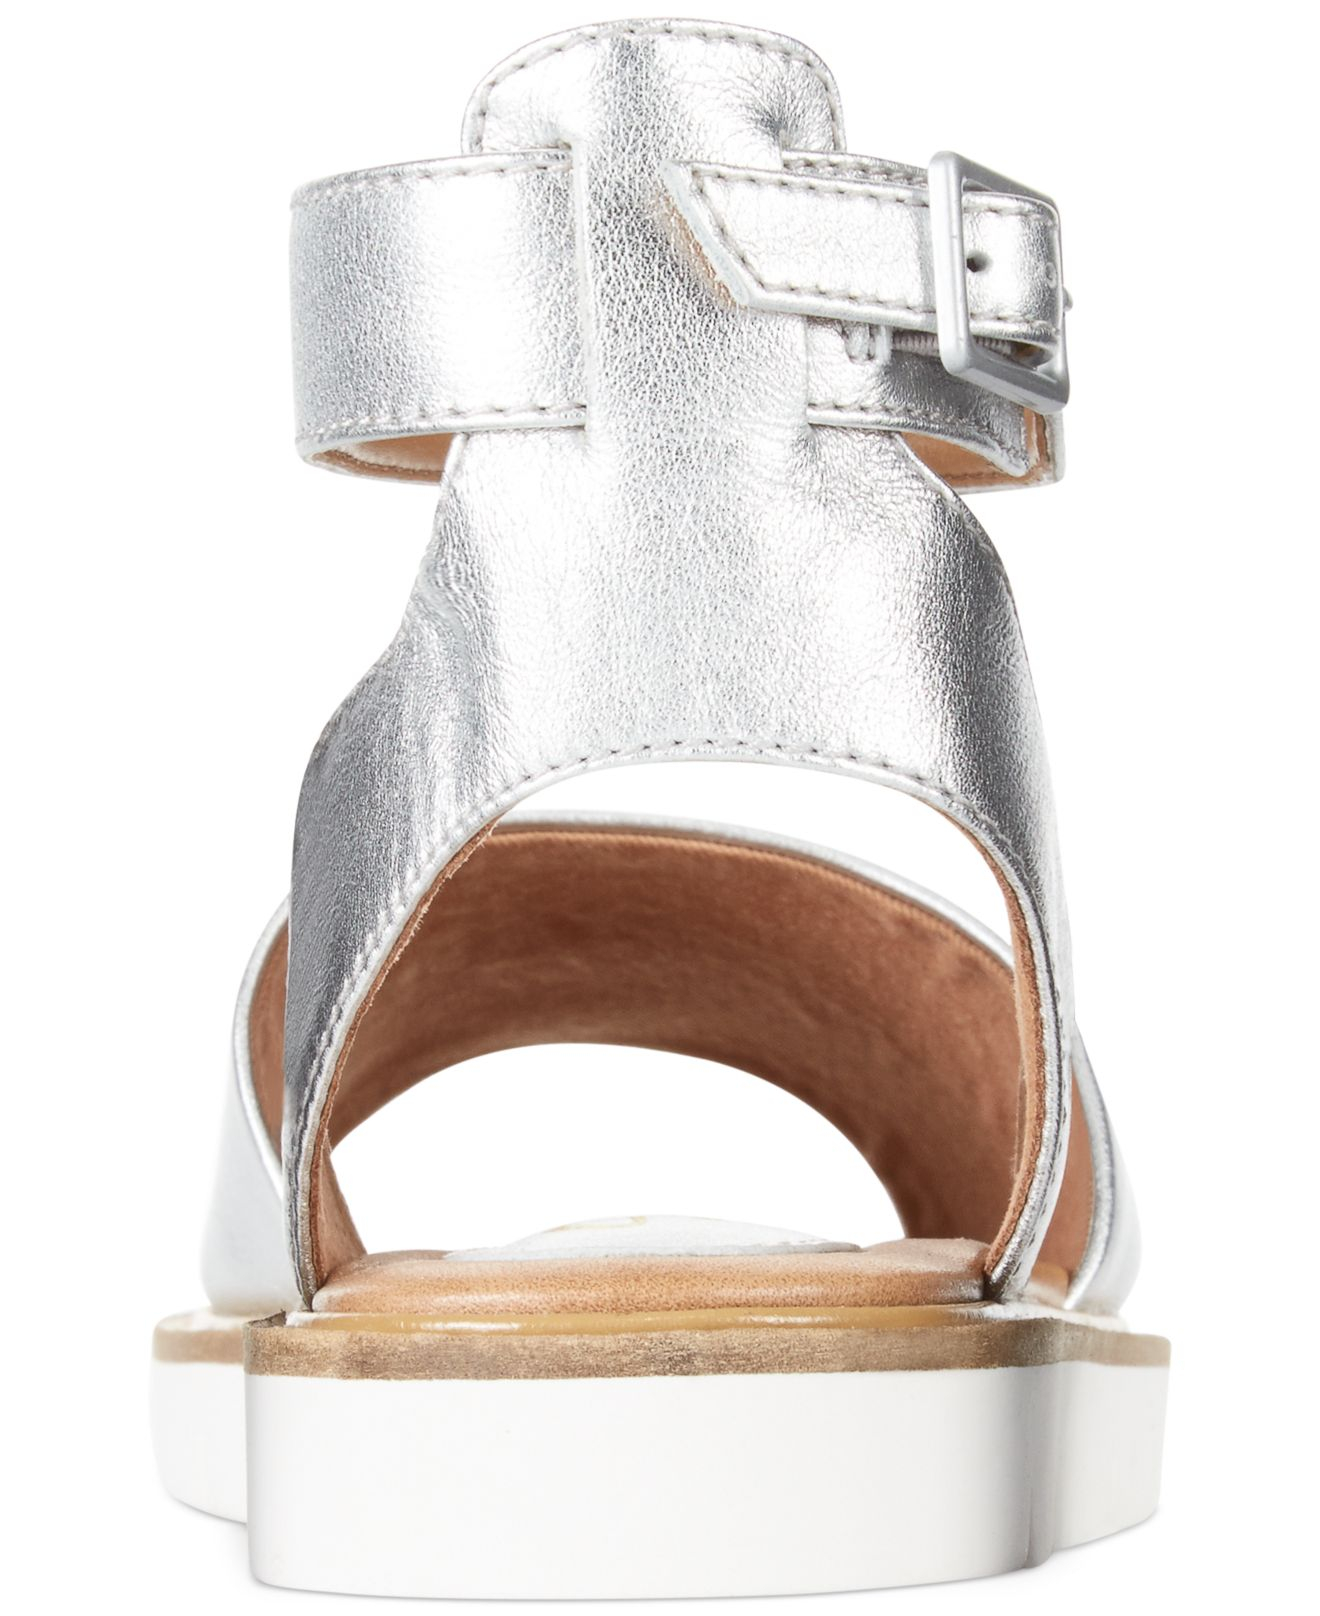 16f86c23f8c1 Lyst - Clarks Artisan Women s Lydie Hala Flat Sandals in Metallic